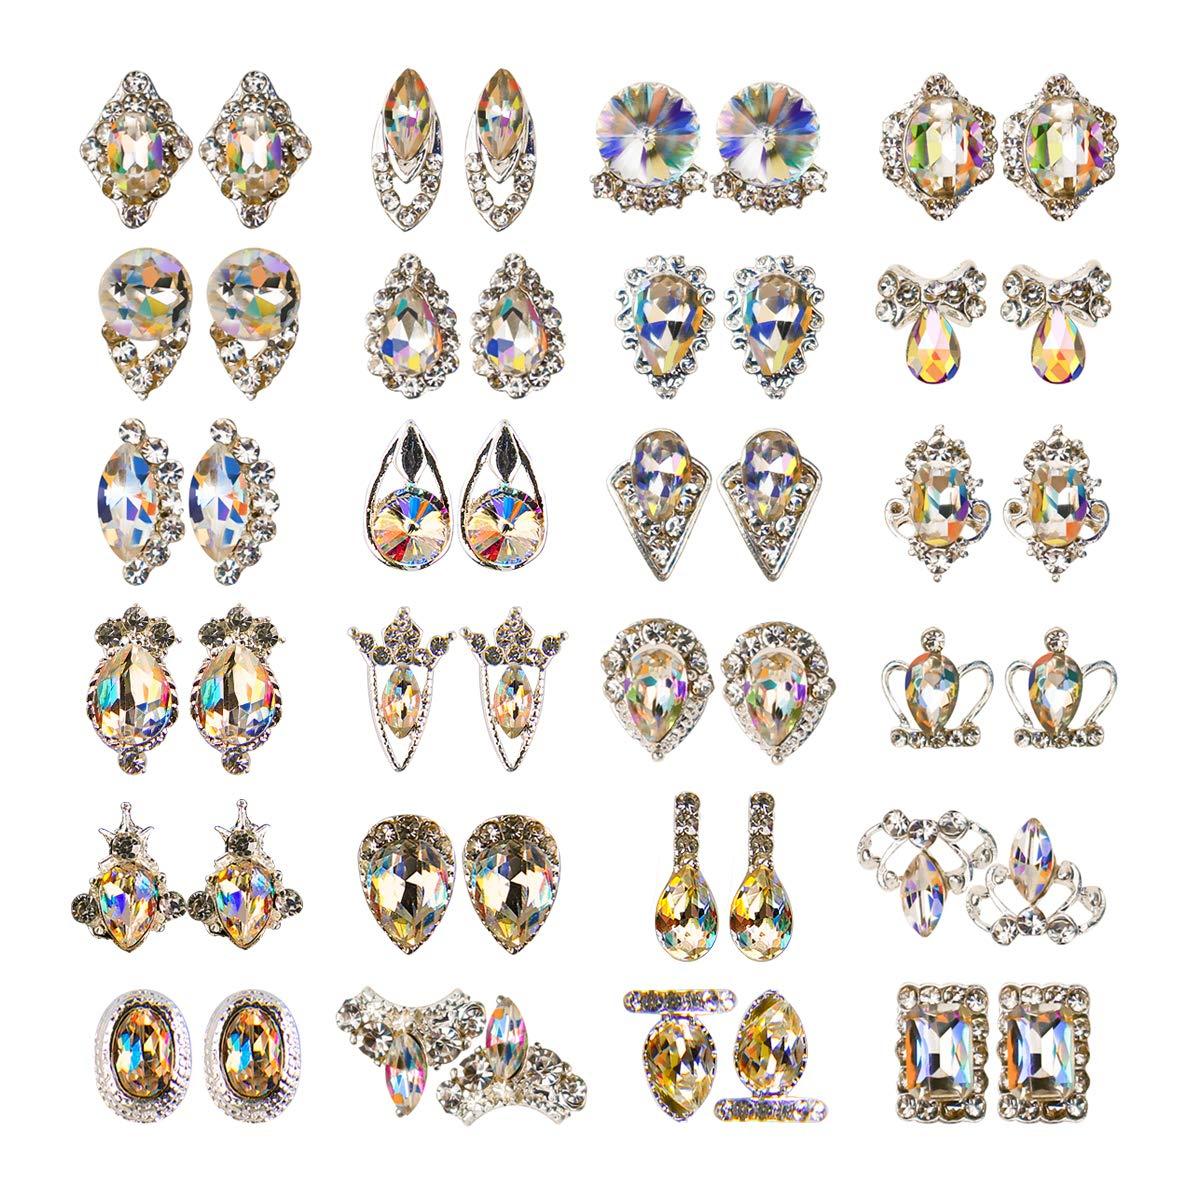 48pcs Nail Crystal Max 73% OFF Bargain sale AB Rhinestones Gem Diamonds Metal Glass